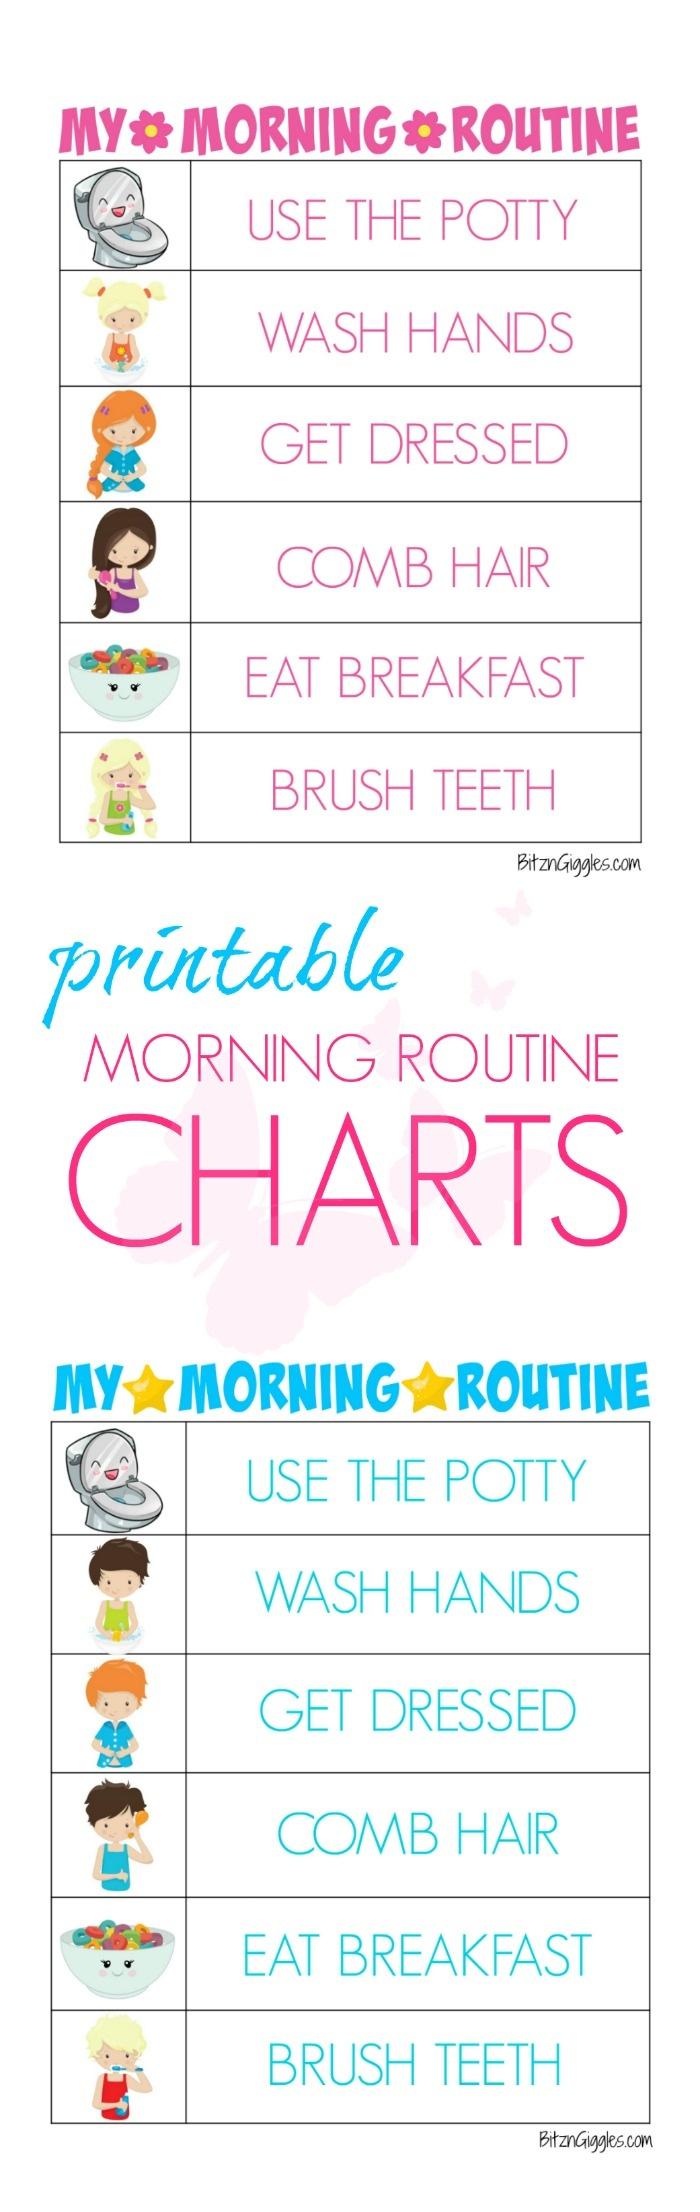 Printable Morning Routine Charts - Bitz & Giggles - Free Printable Morning Routine Charts With Pictures